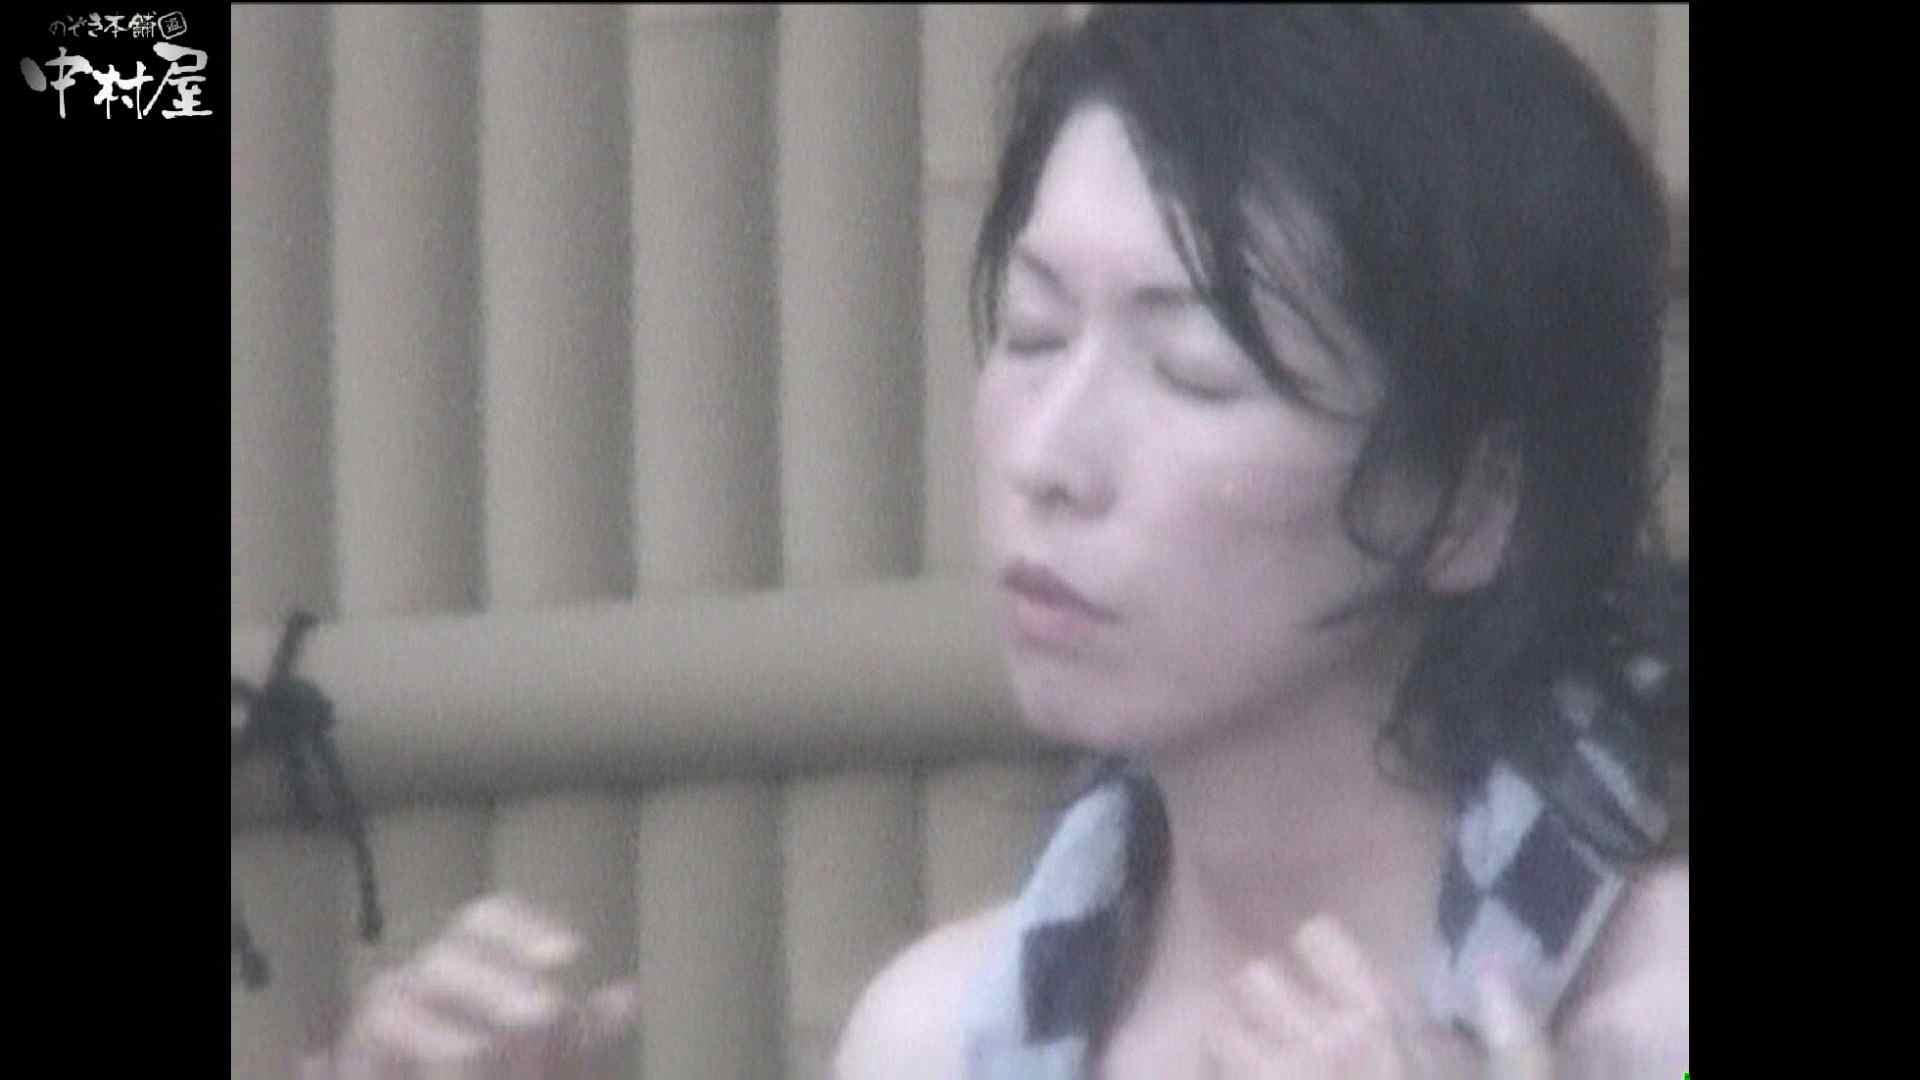 Aquaな露天風呂Vol.987 露天 オマンコ無修正動画無料 71画像 47